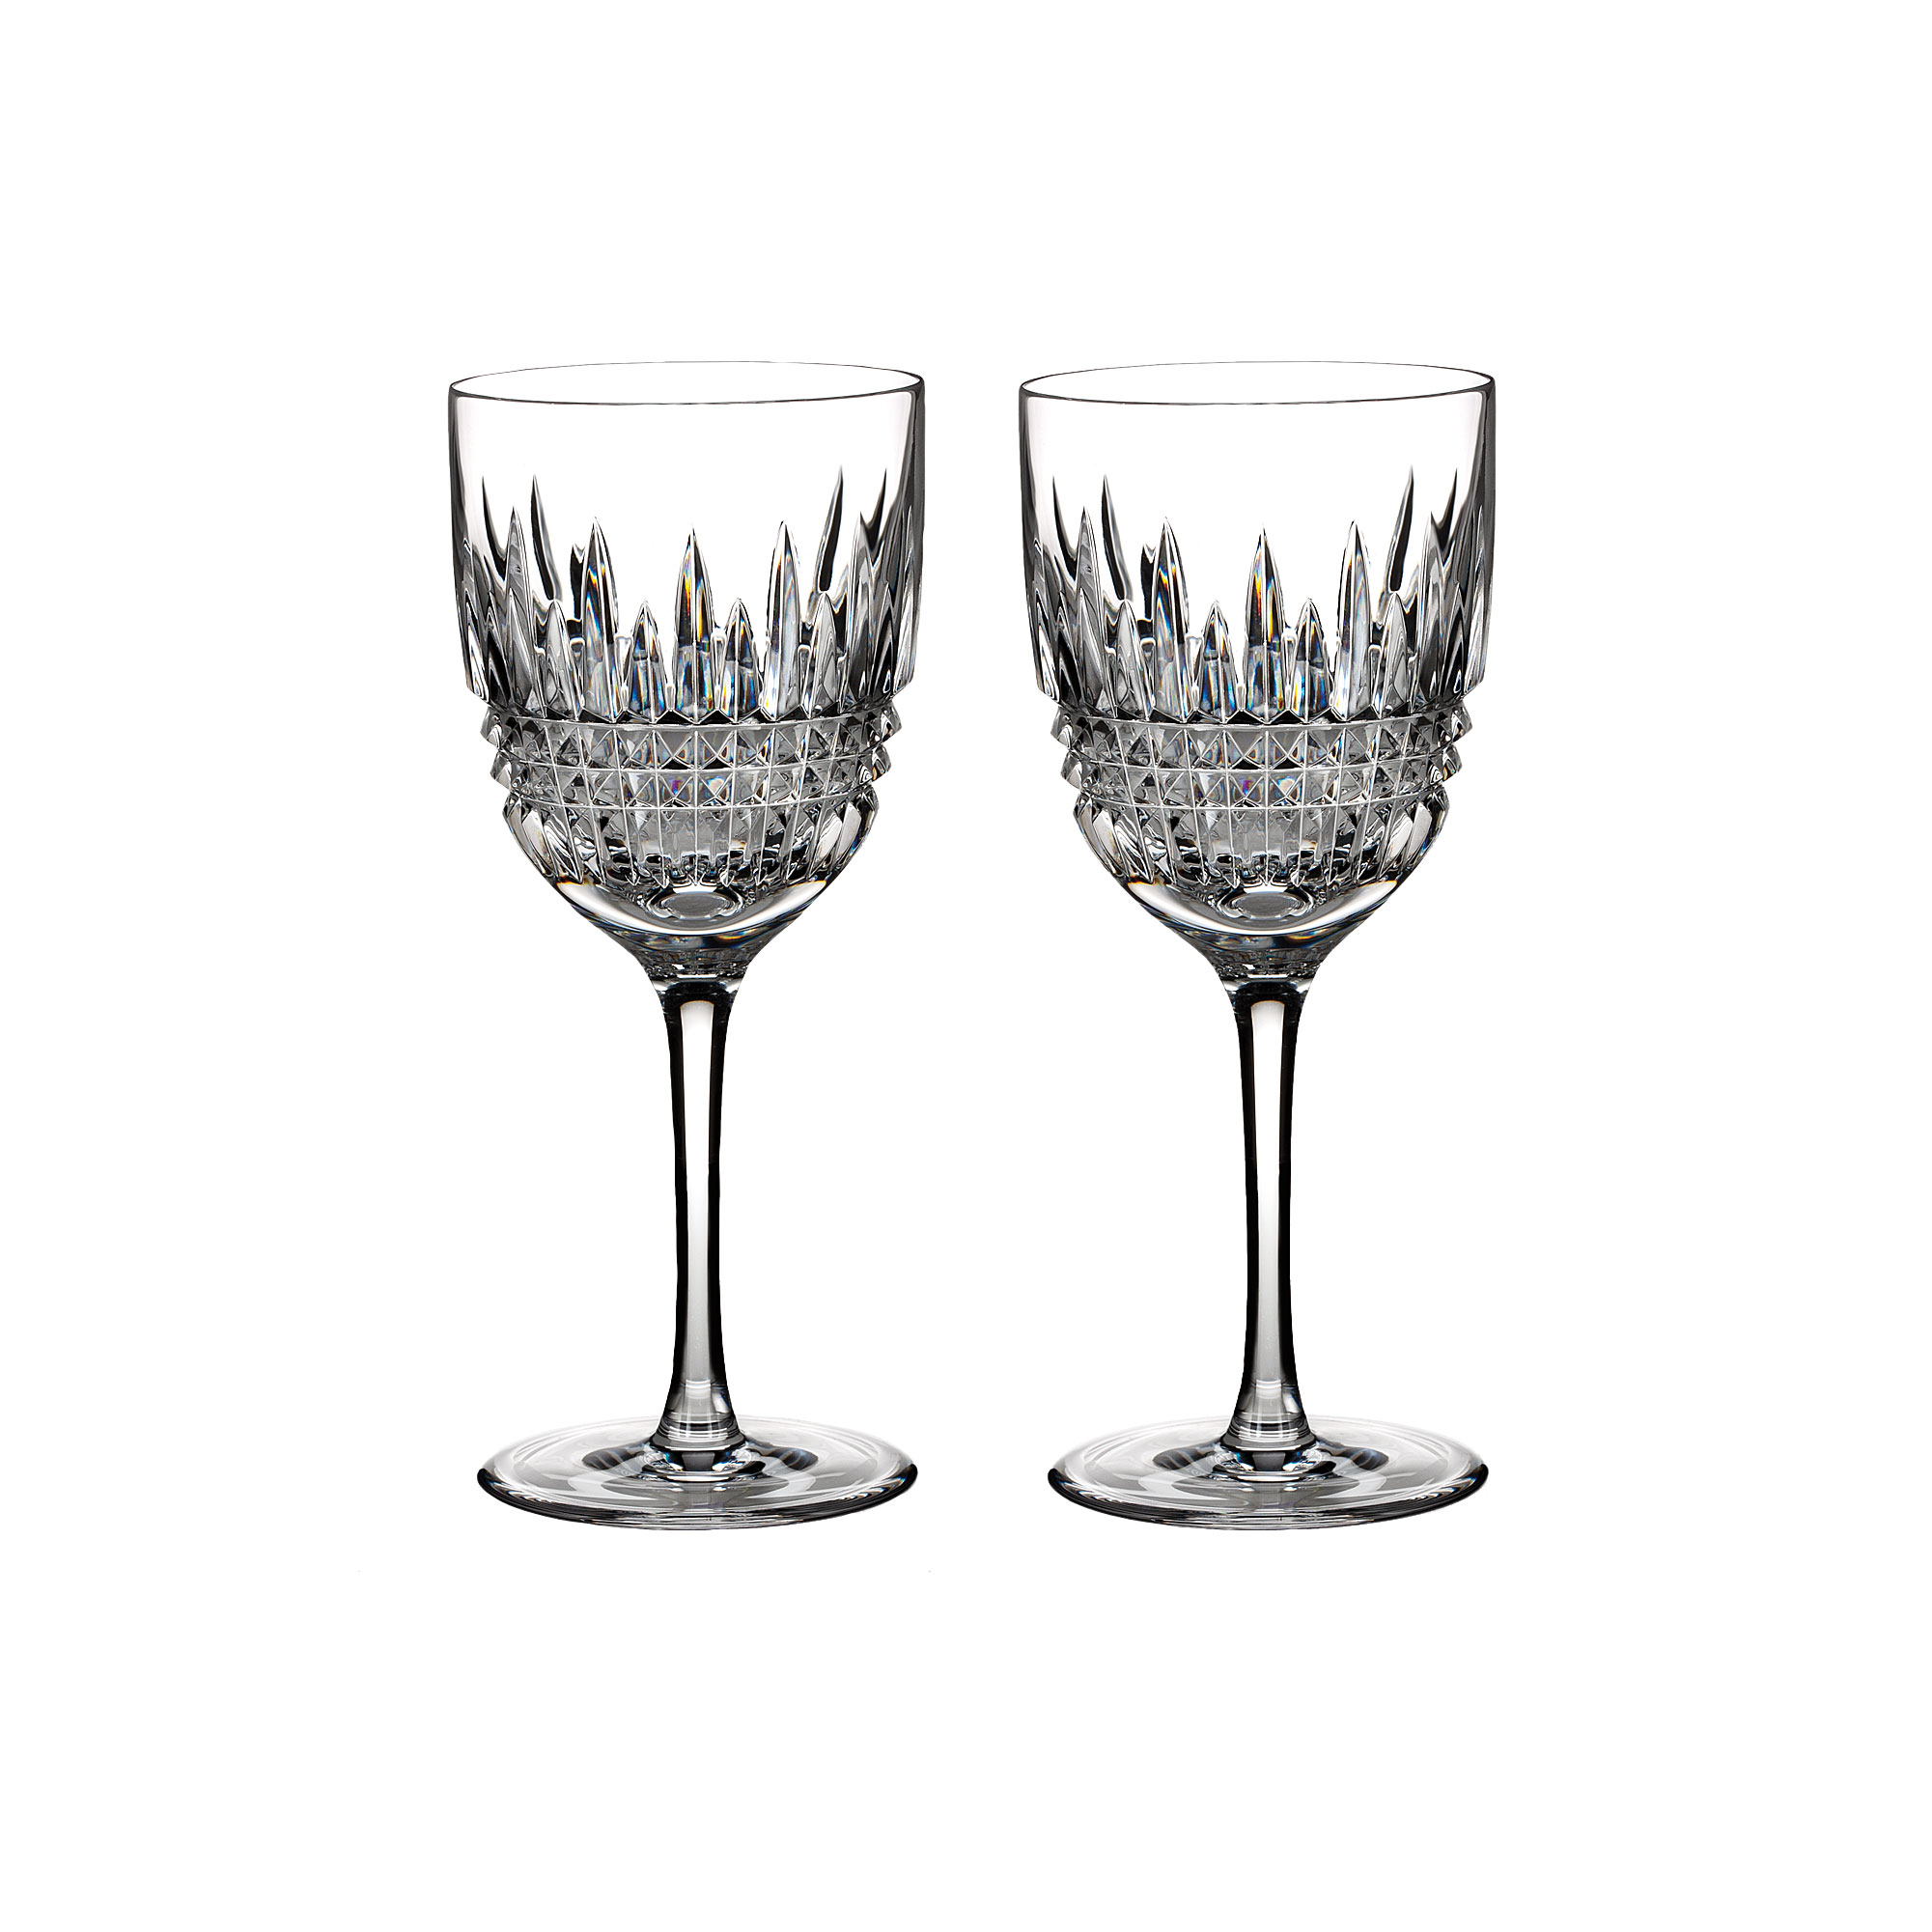 Waterford Crystal, Lismore Diamond Goblet, Red Wine, Pair